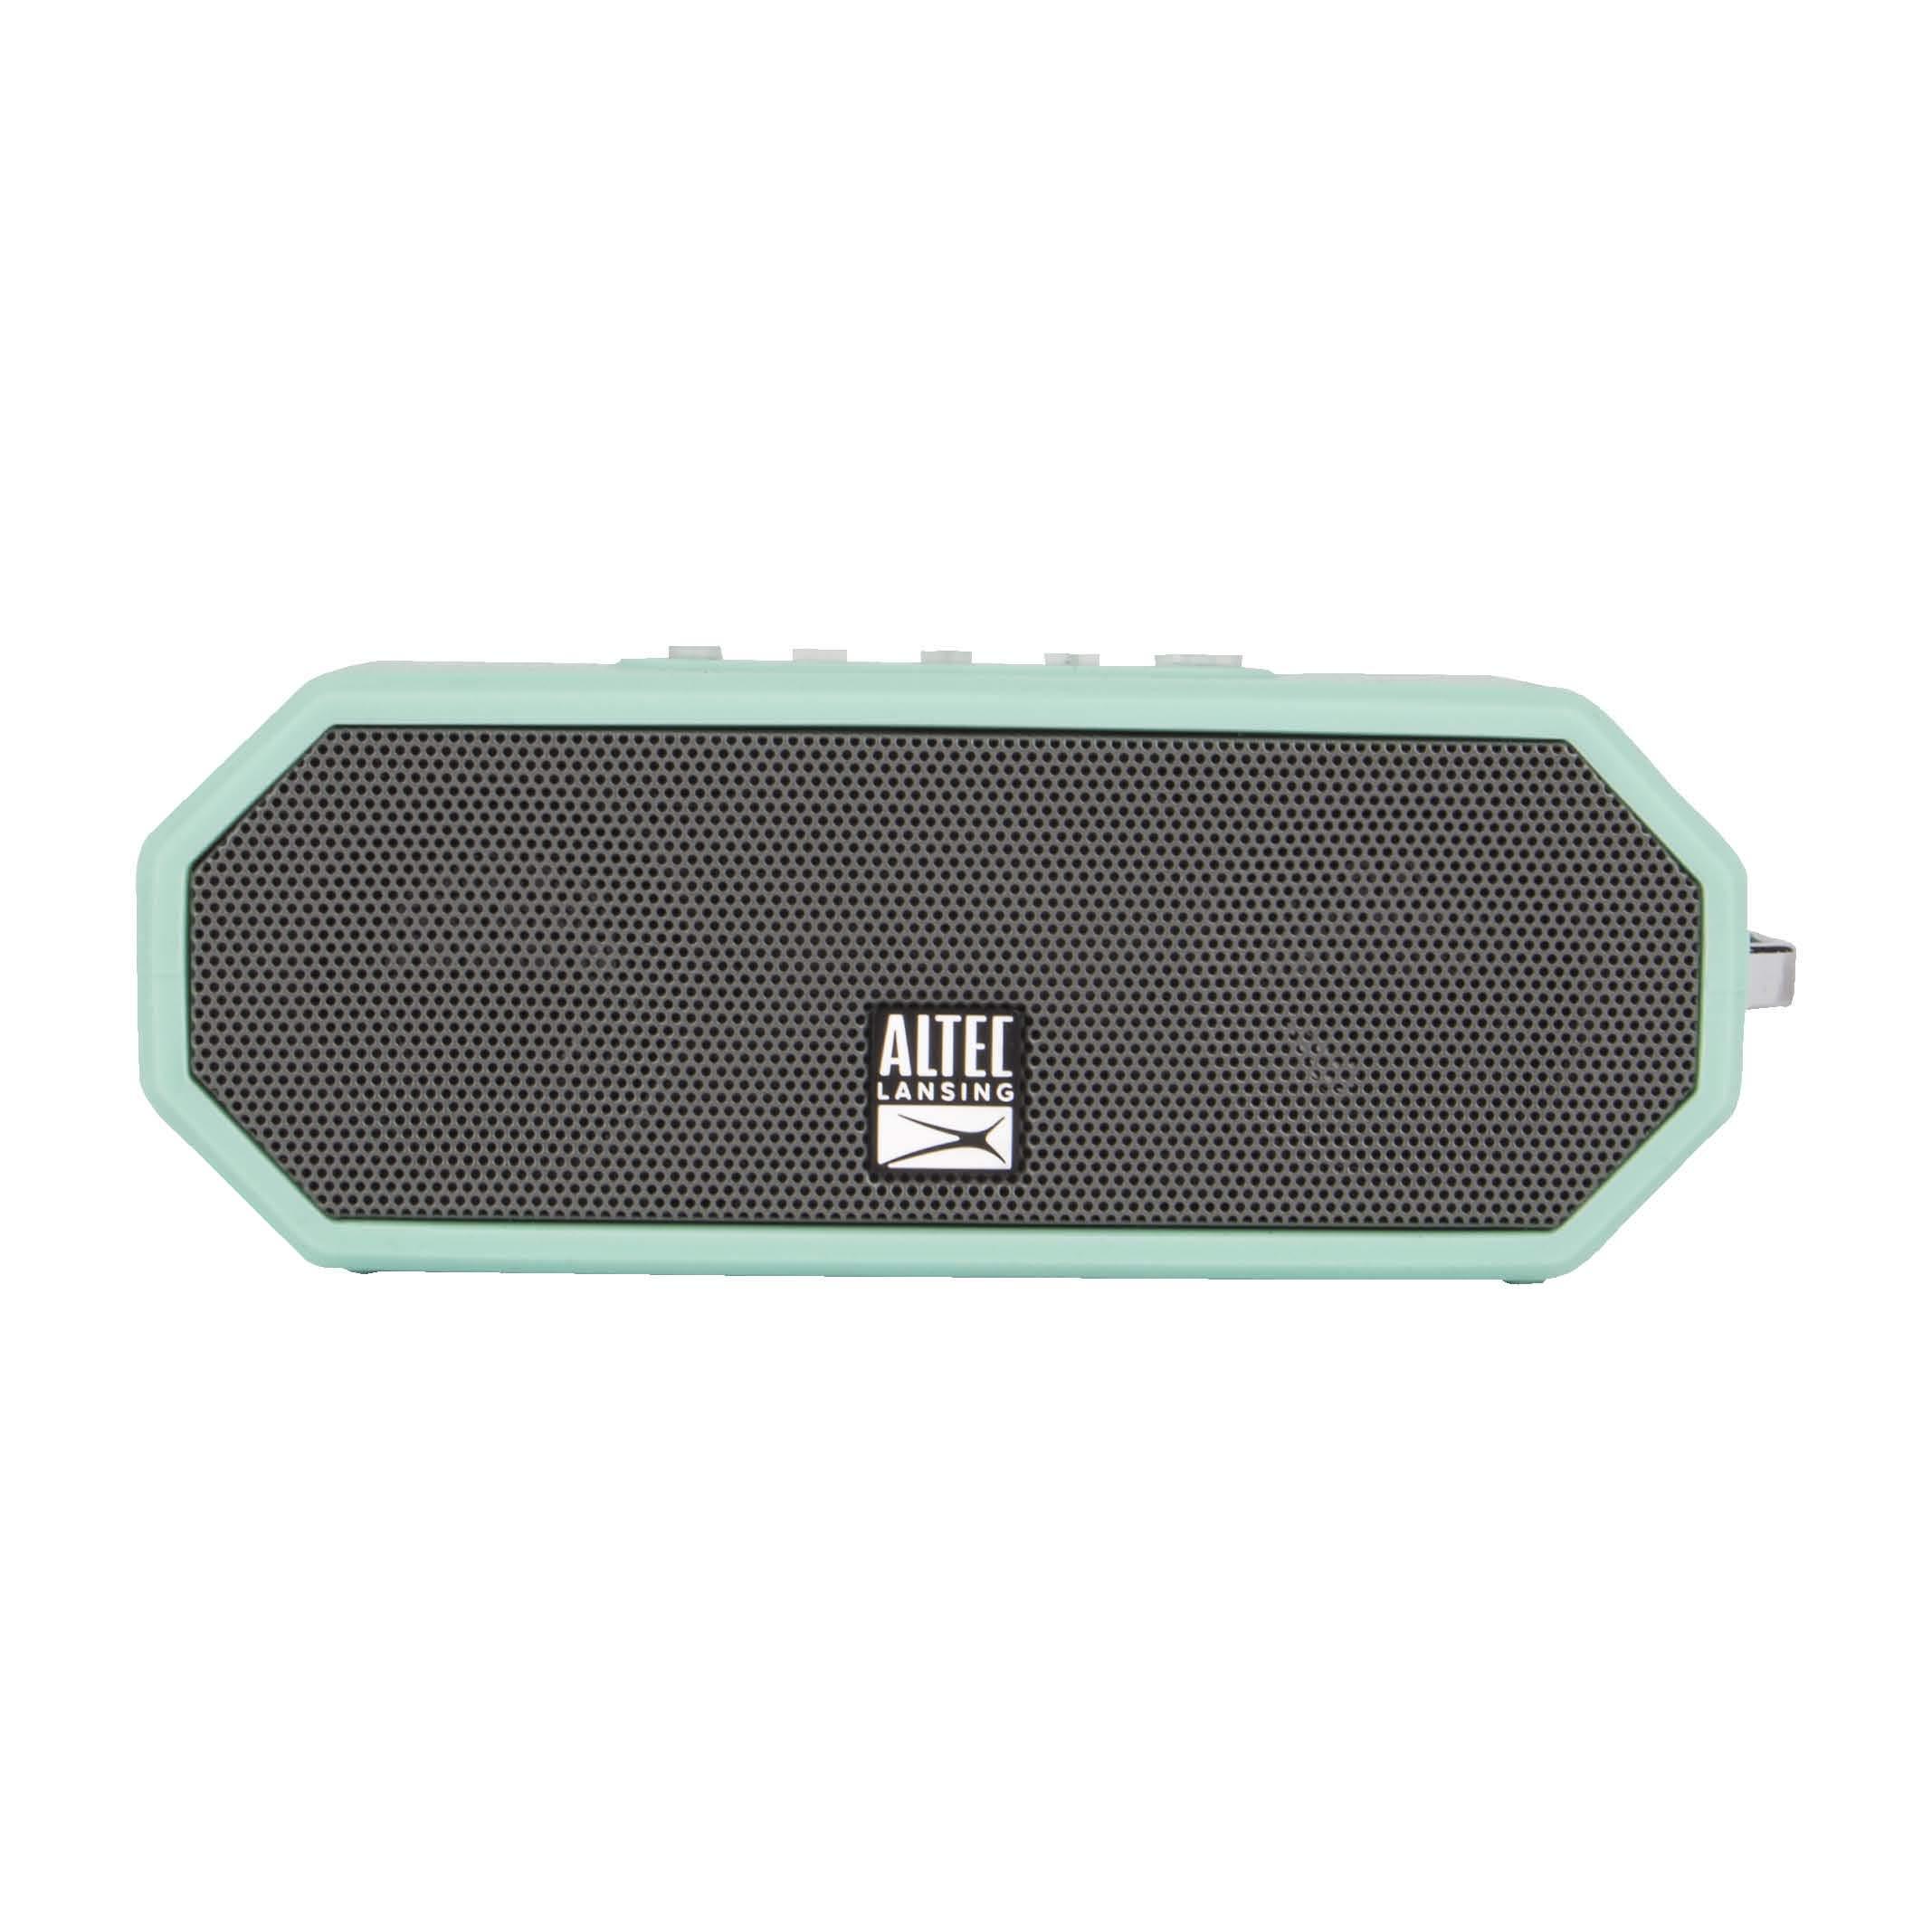 Parlante Bluetooth Altec Lansing IMW449 Jacket H2O 4 Rugged